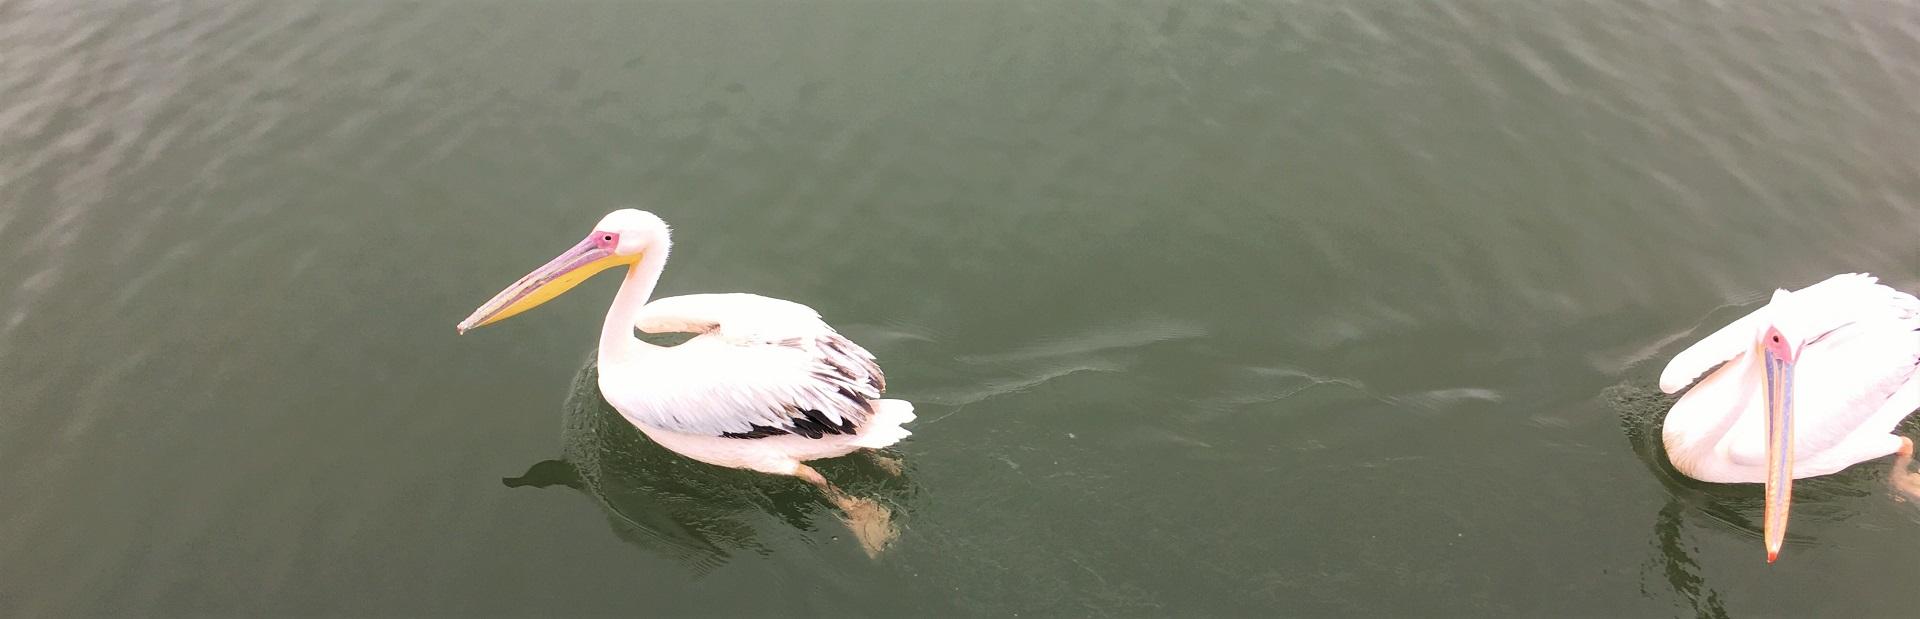 Walvis Bay IMG_6543 (2)